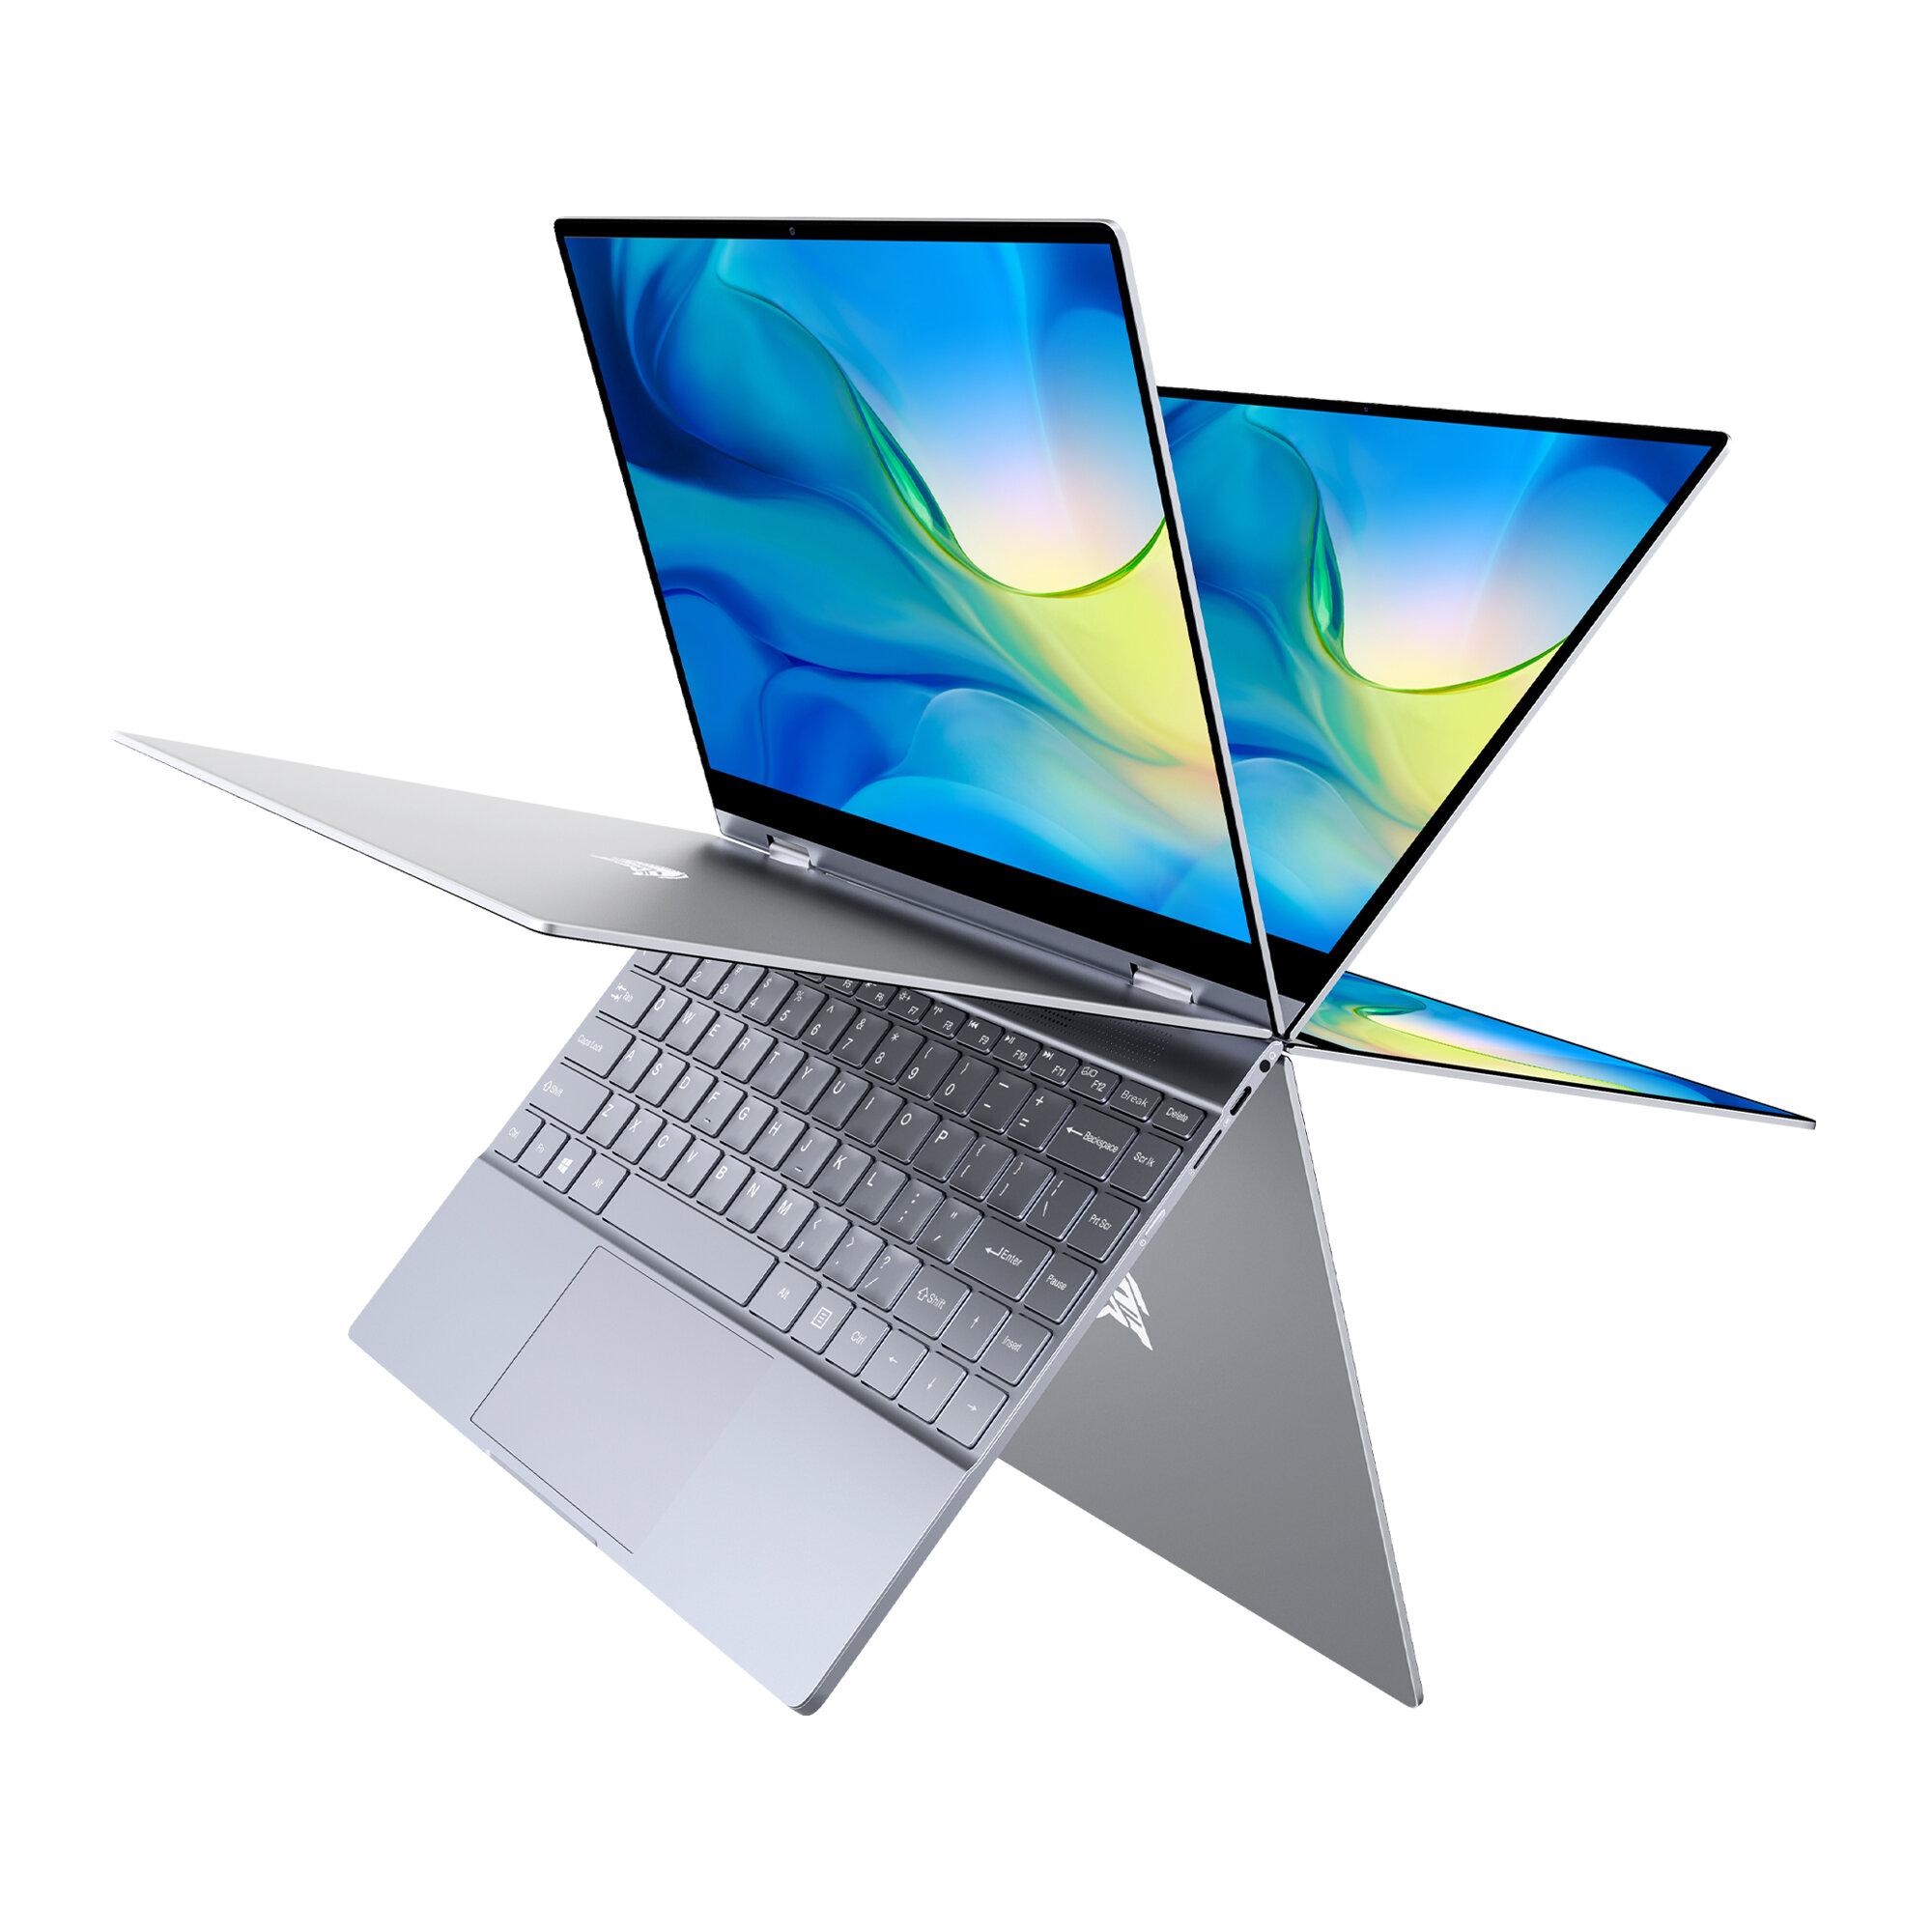 BMAX Y13 Laptop 360-degree 13.3 inch Intel Gemini Lake N4100 Intel UHD Graphics 600 8GB LPDDR4 RAM 256GB SSD Notebook